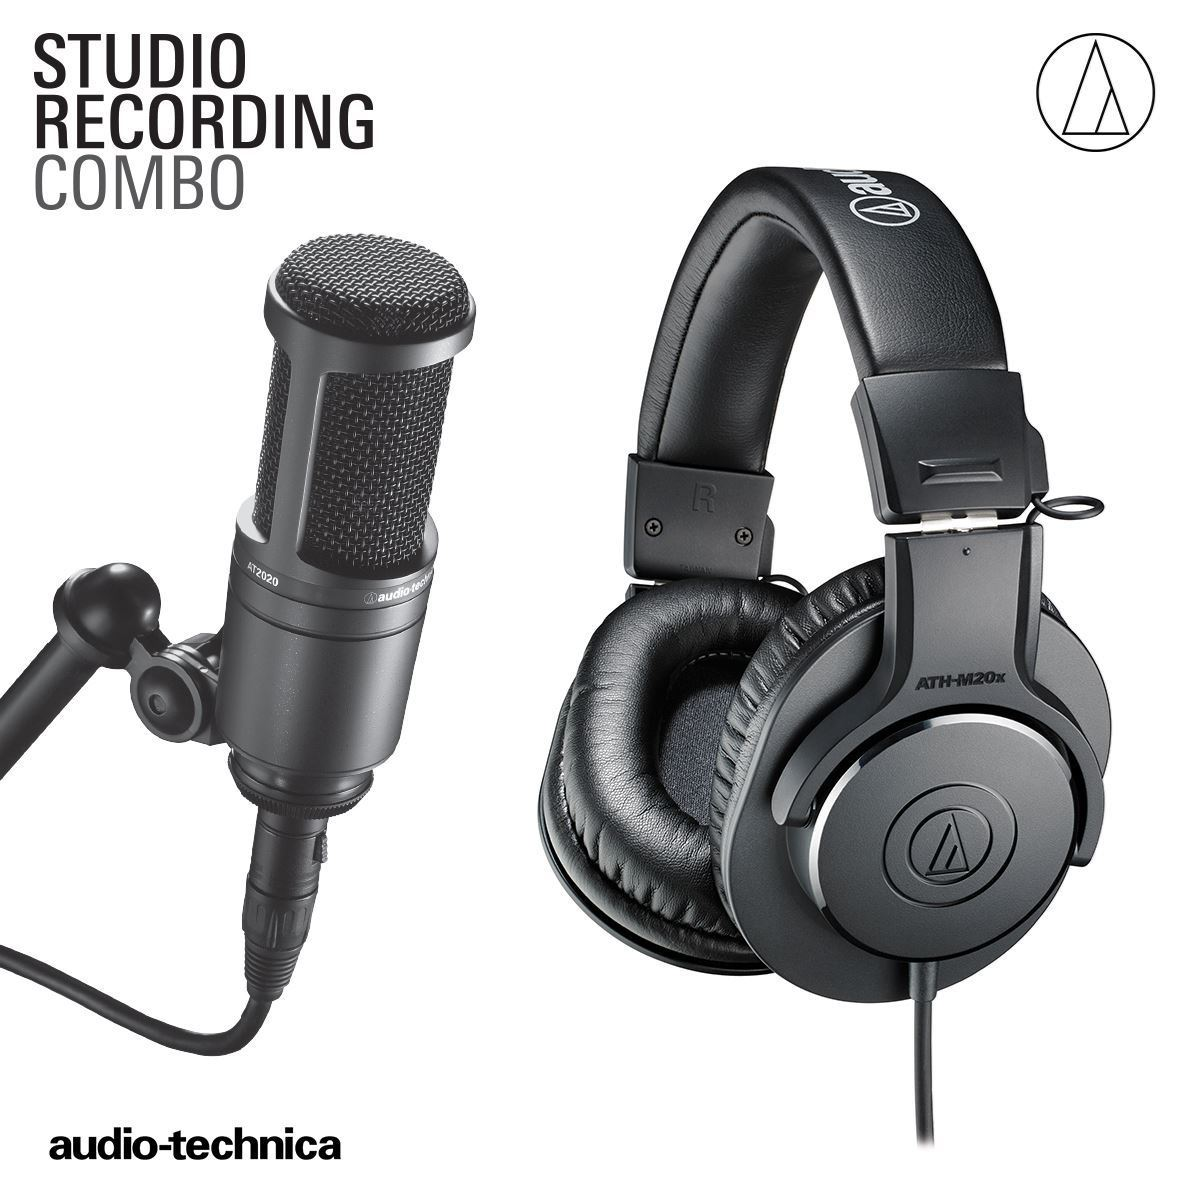 Audio Technica Studio Recording Combo Pack